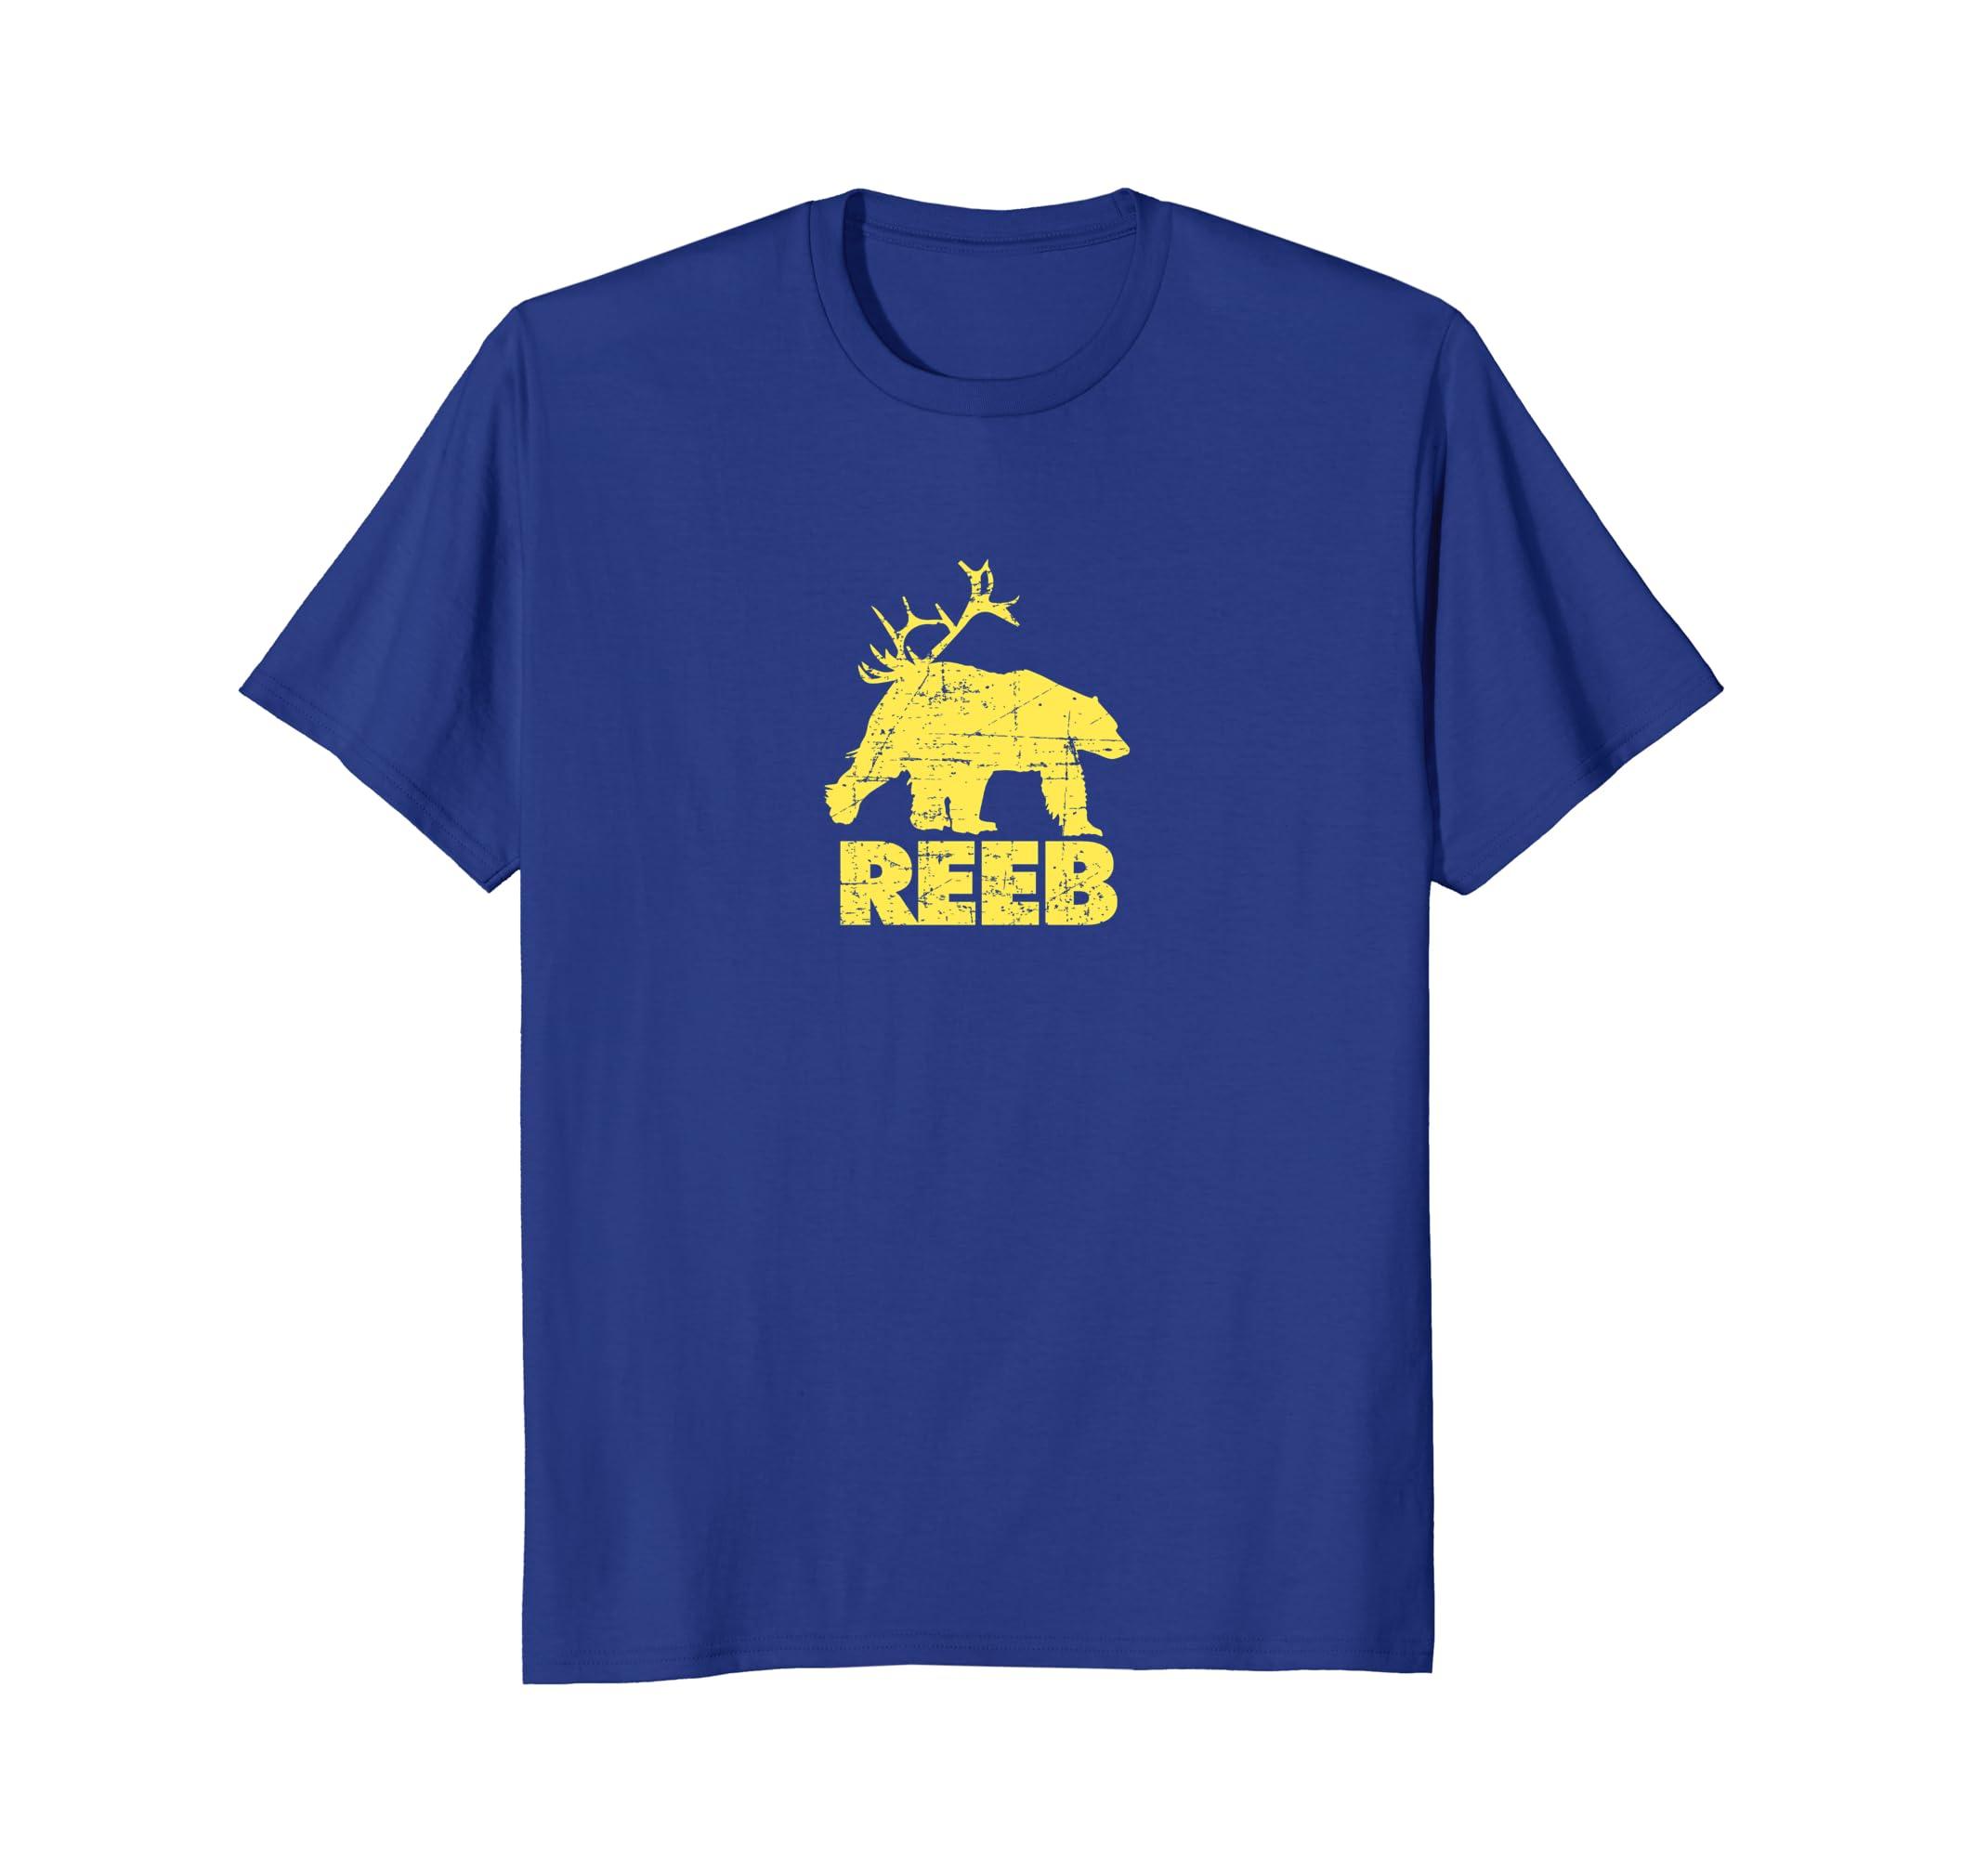 226a4c6f81533 REEB Funny Riff on Bear Deer BEER T-shirt